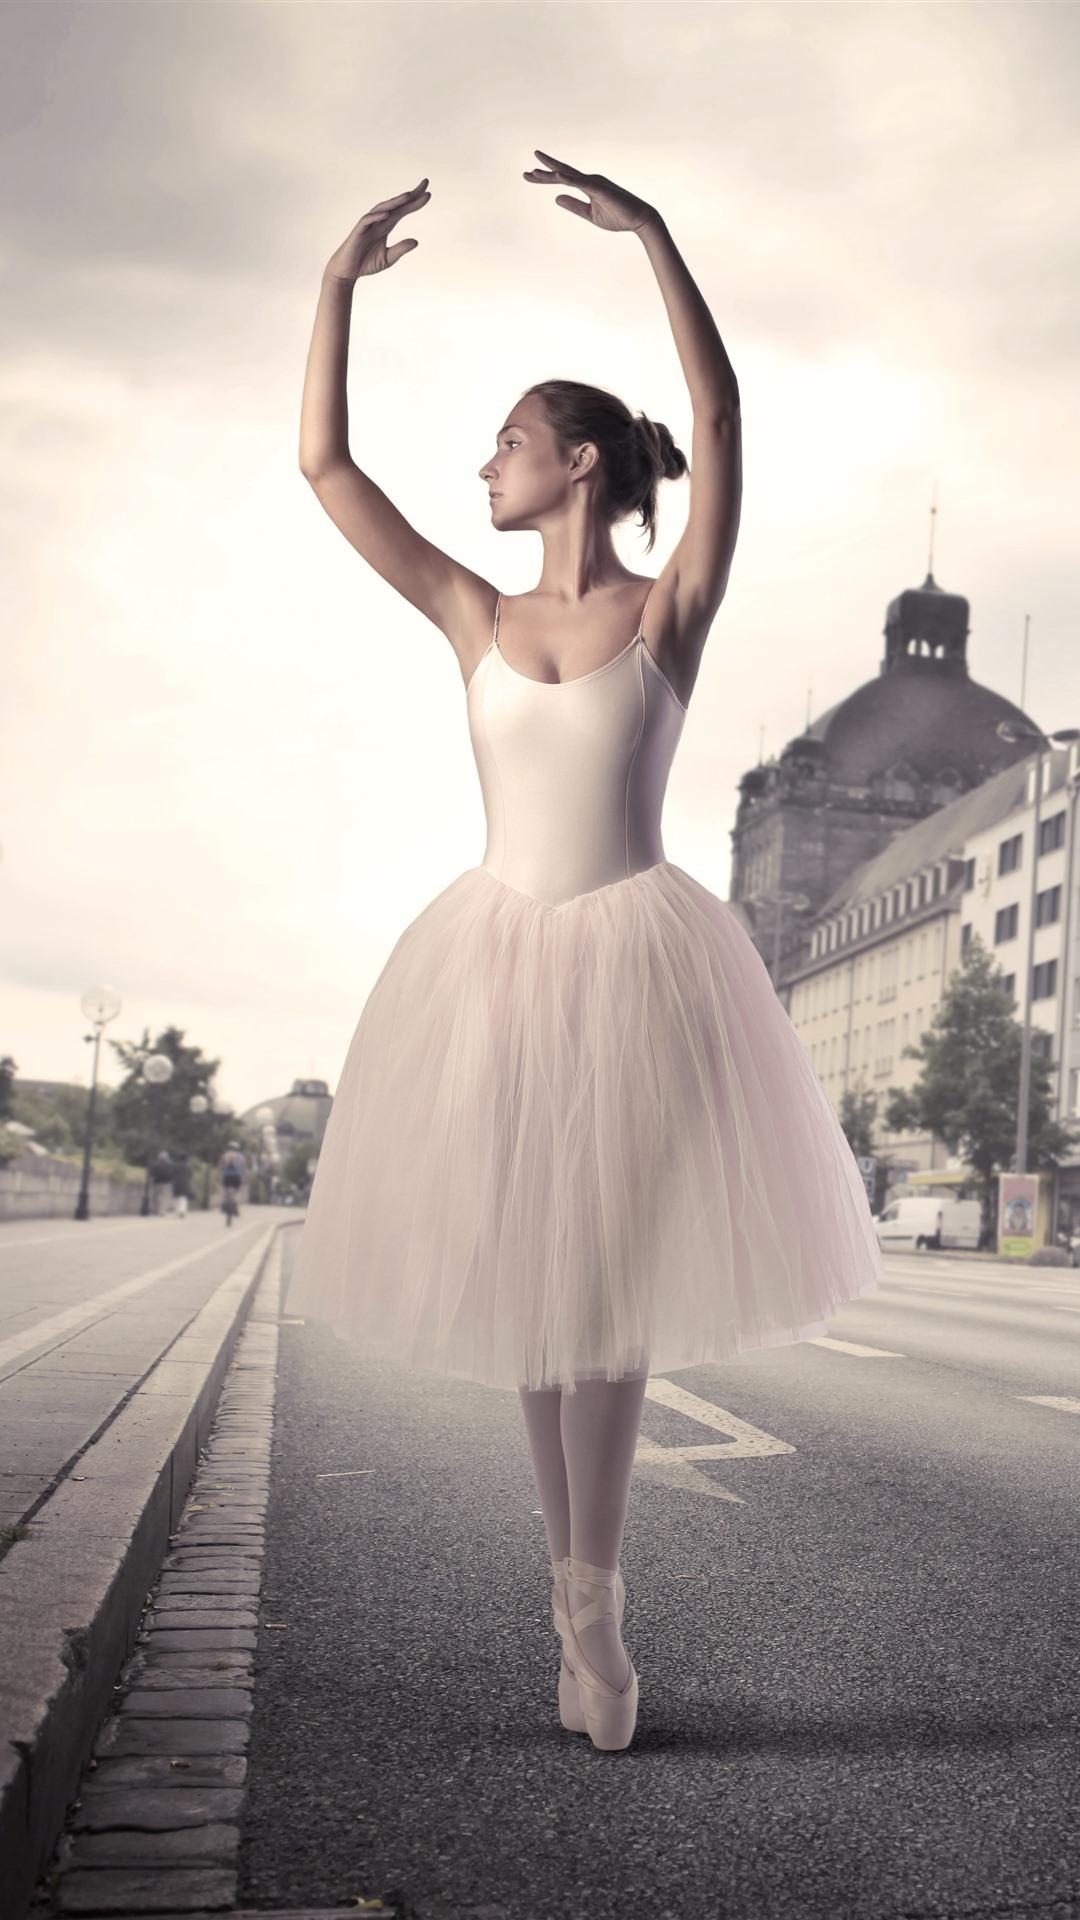 Wallpaper Beautiful Ballerina Girl Dance Street City 5120x2880 Uhd 5k Picture Image